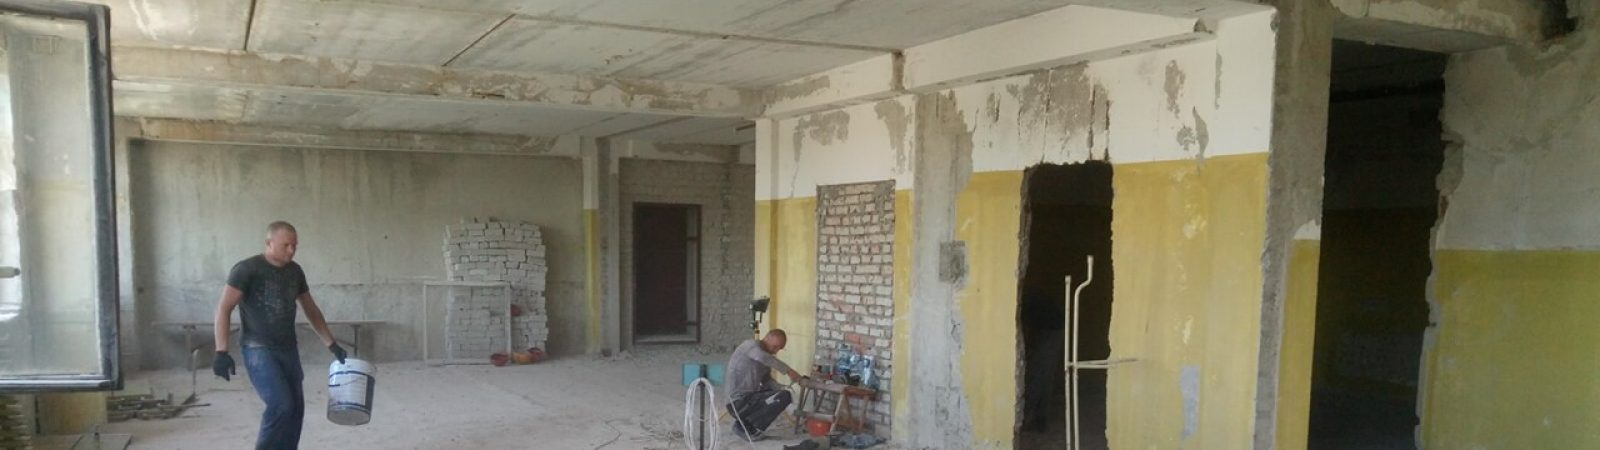 Подготовка зданий к ремонту